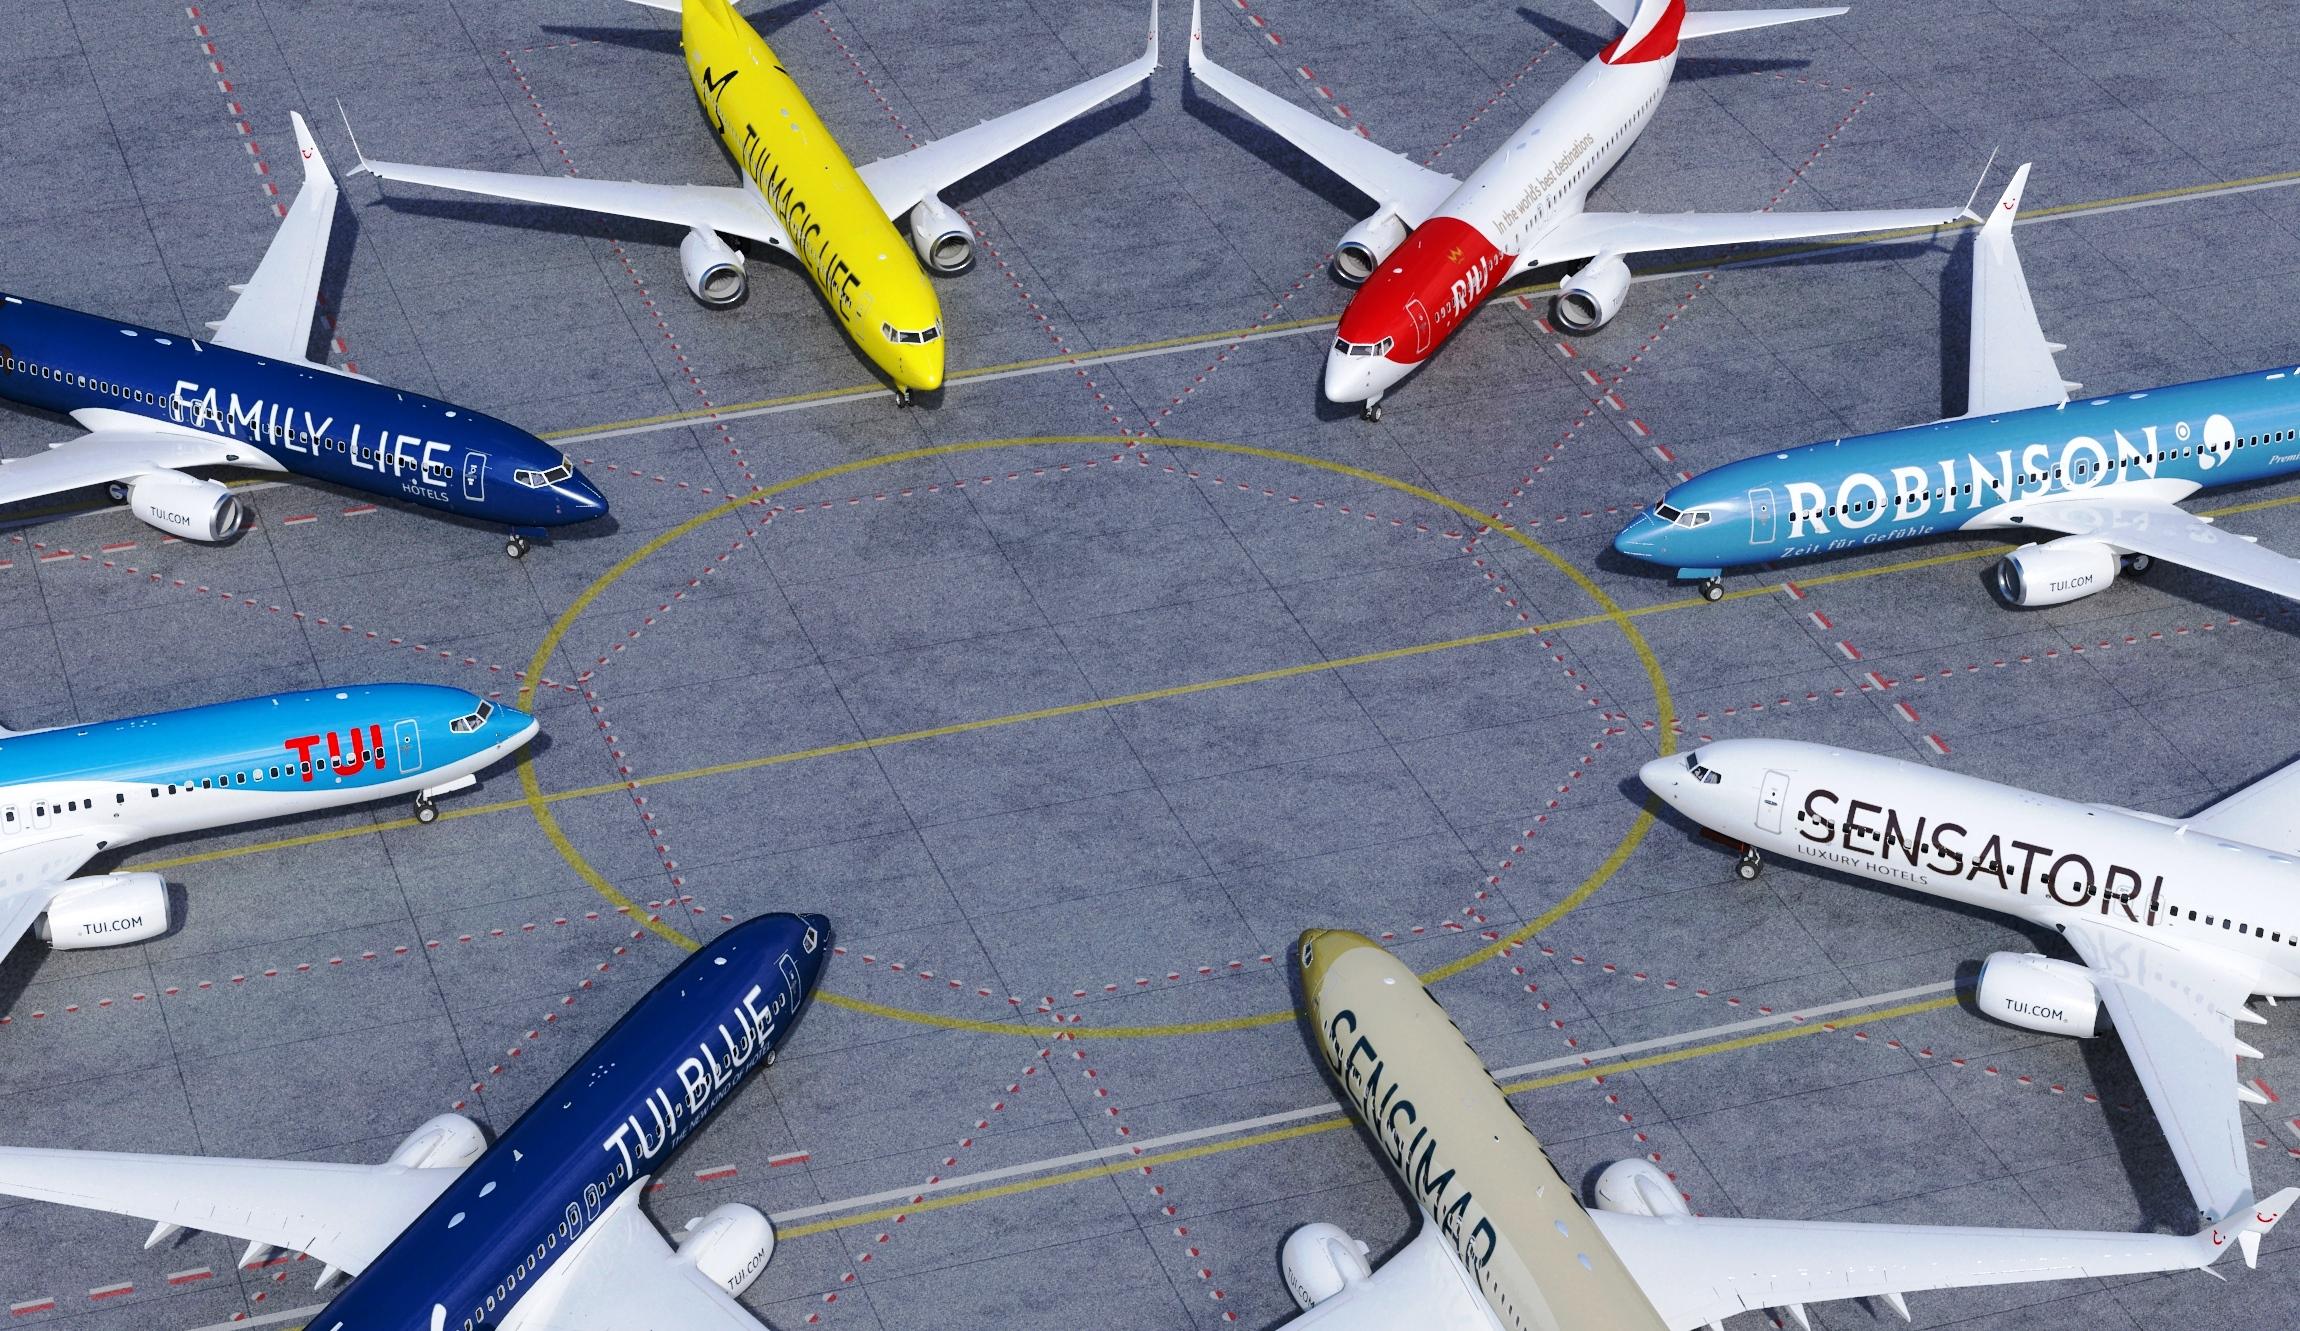 Fly fra TUIfly i forskellig bemaling. (Foto: TUI Group | PR)